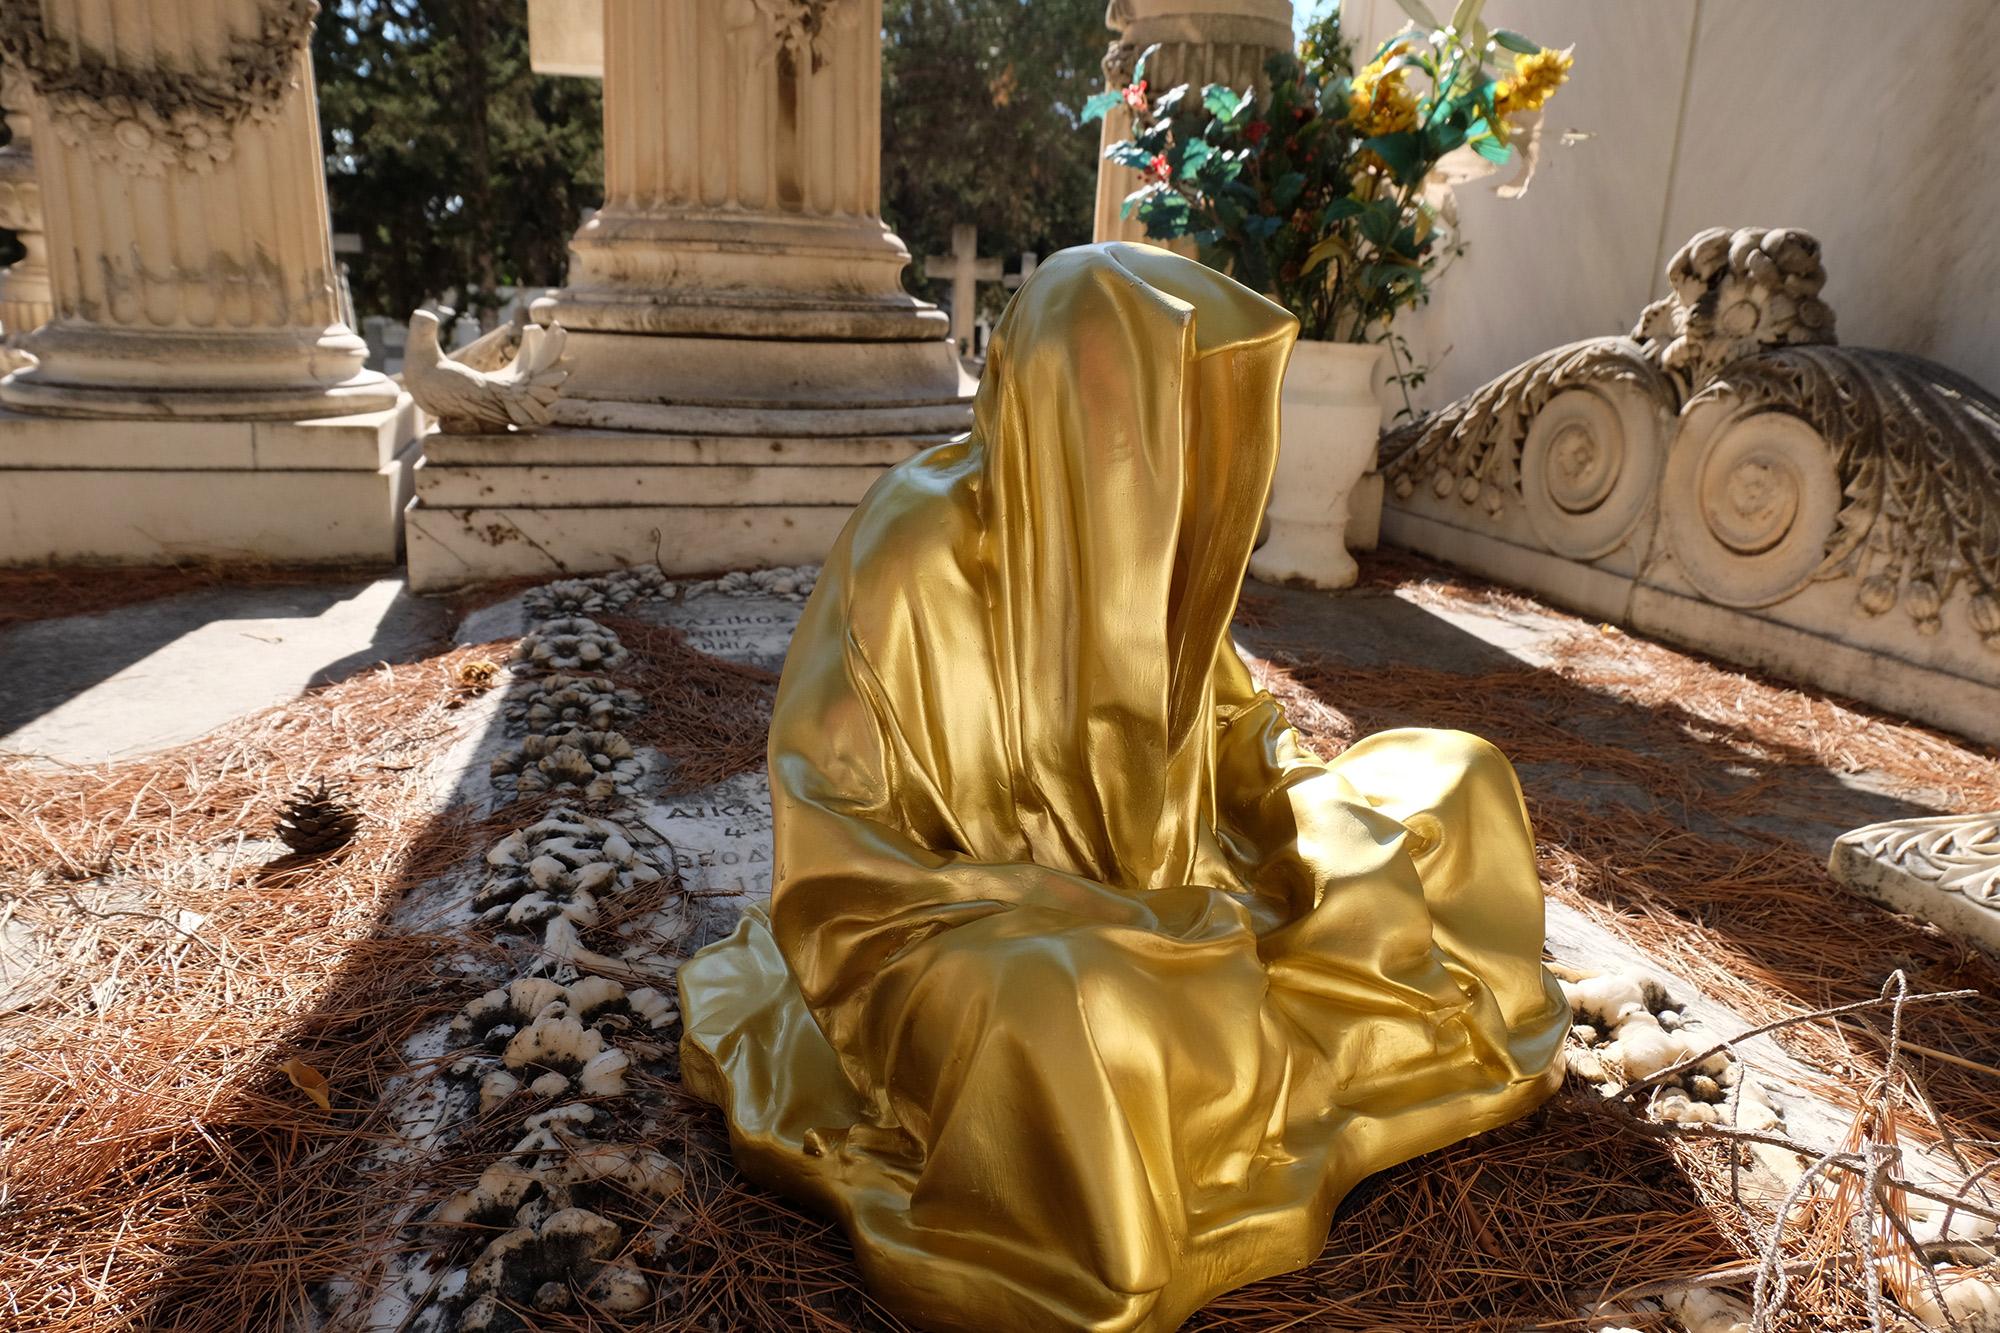 athens-acropolis-guardians-of-time-manfred-kili-kielnhofer-stone-marble-plastic-statue-sculpture-modern-art-fine-arts-arte-gallery-museum-show-8640